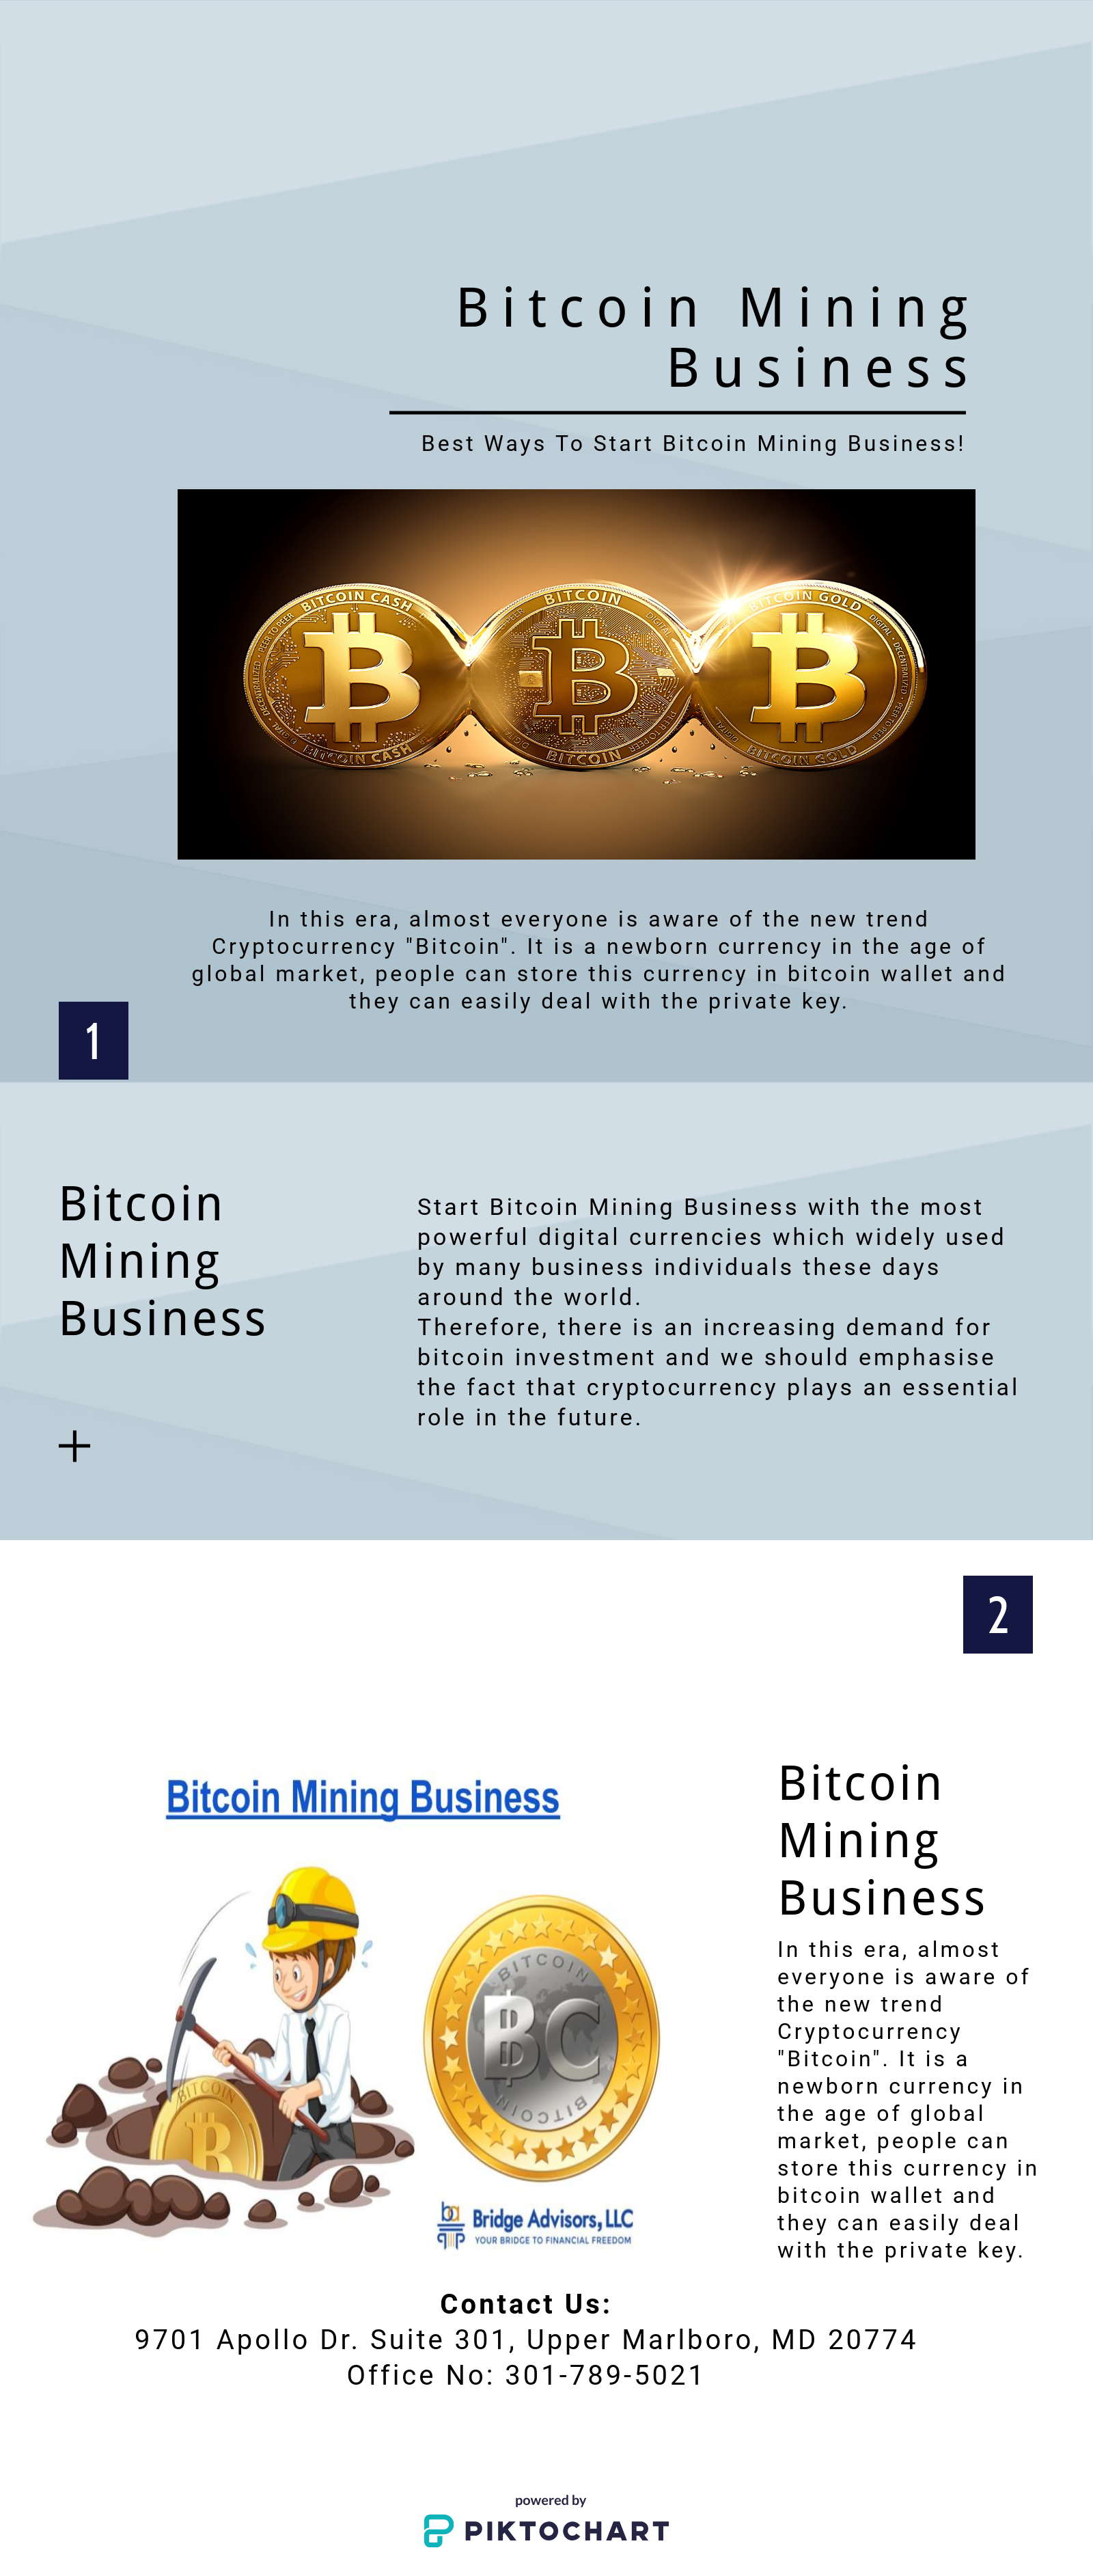 Fresca mining bitcoins win at horse race betting